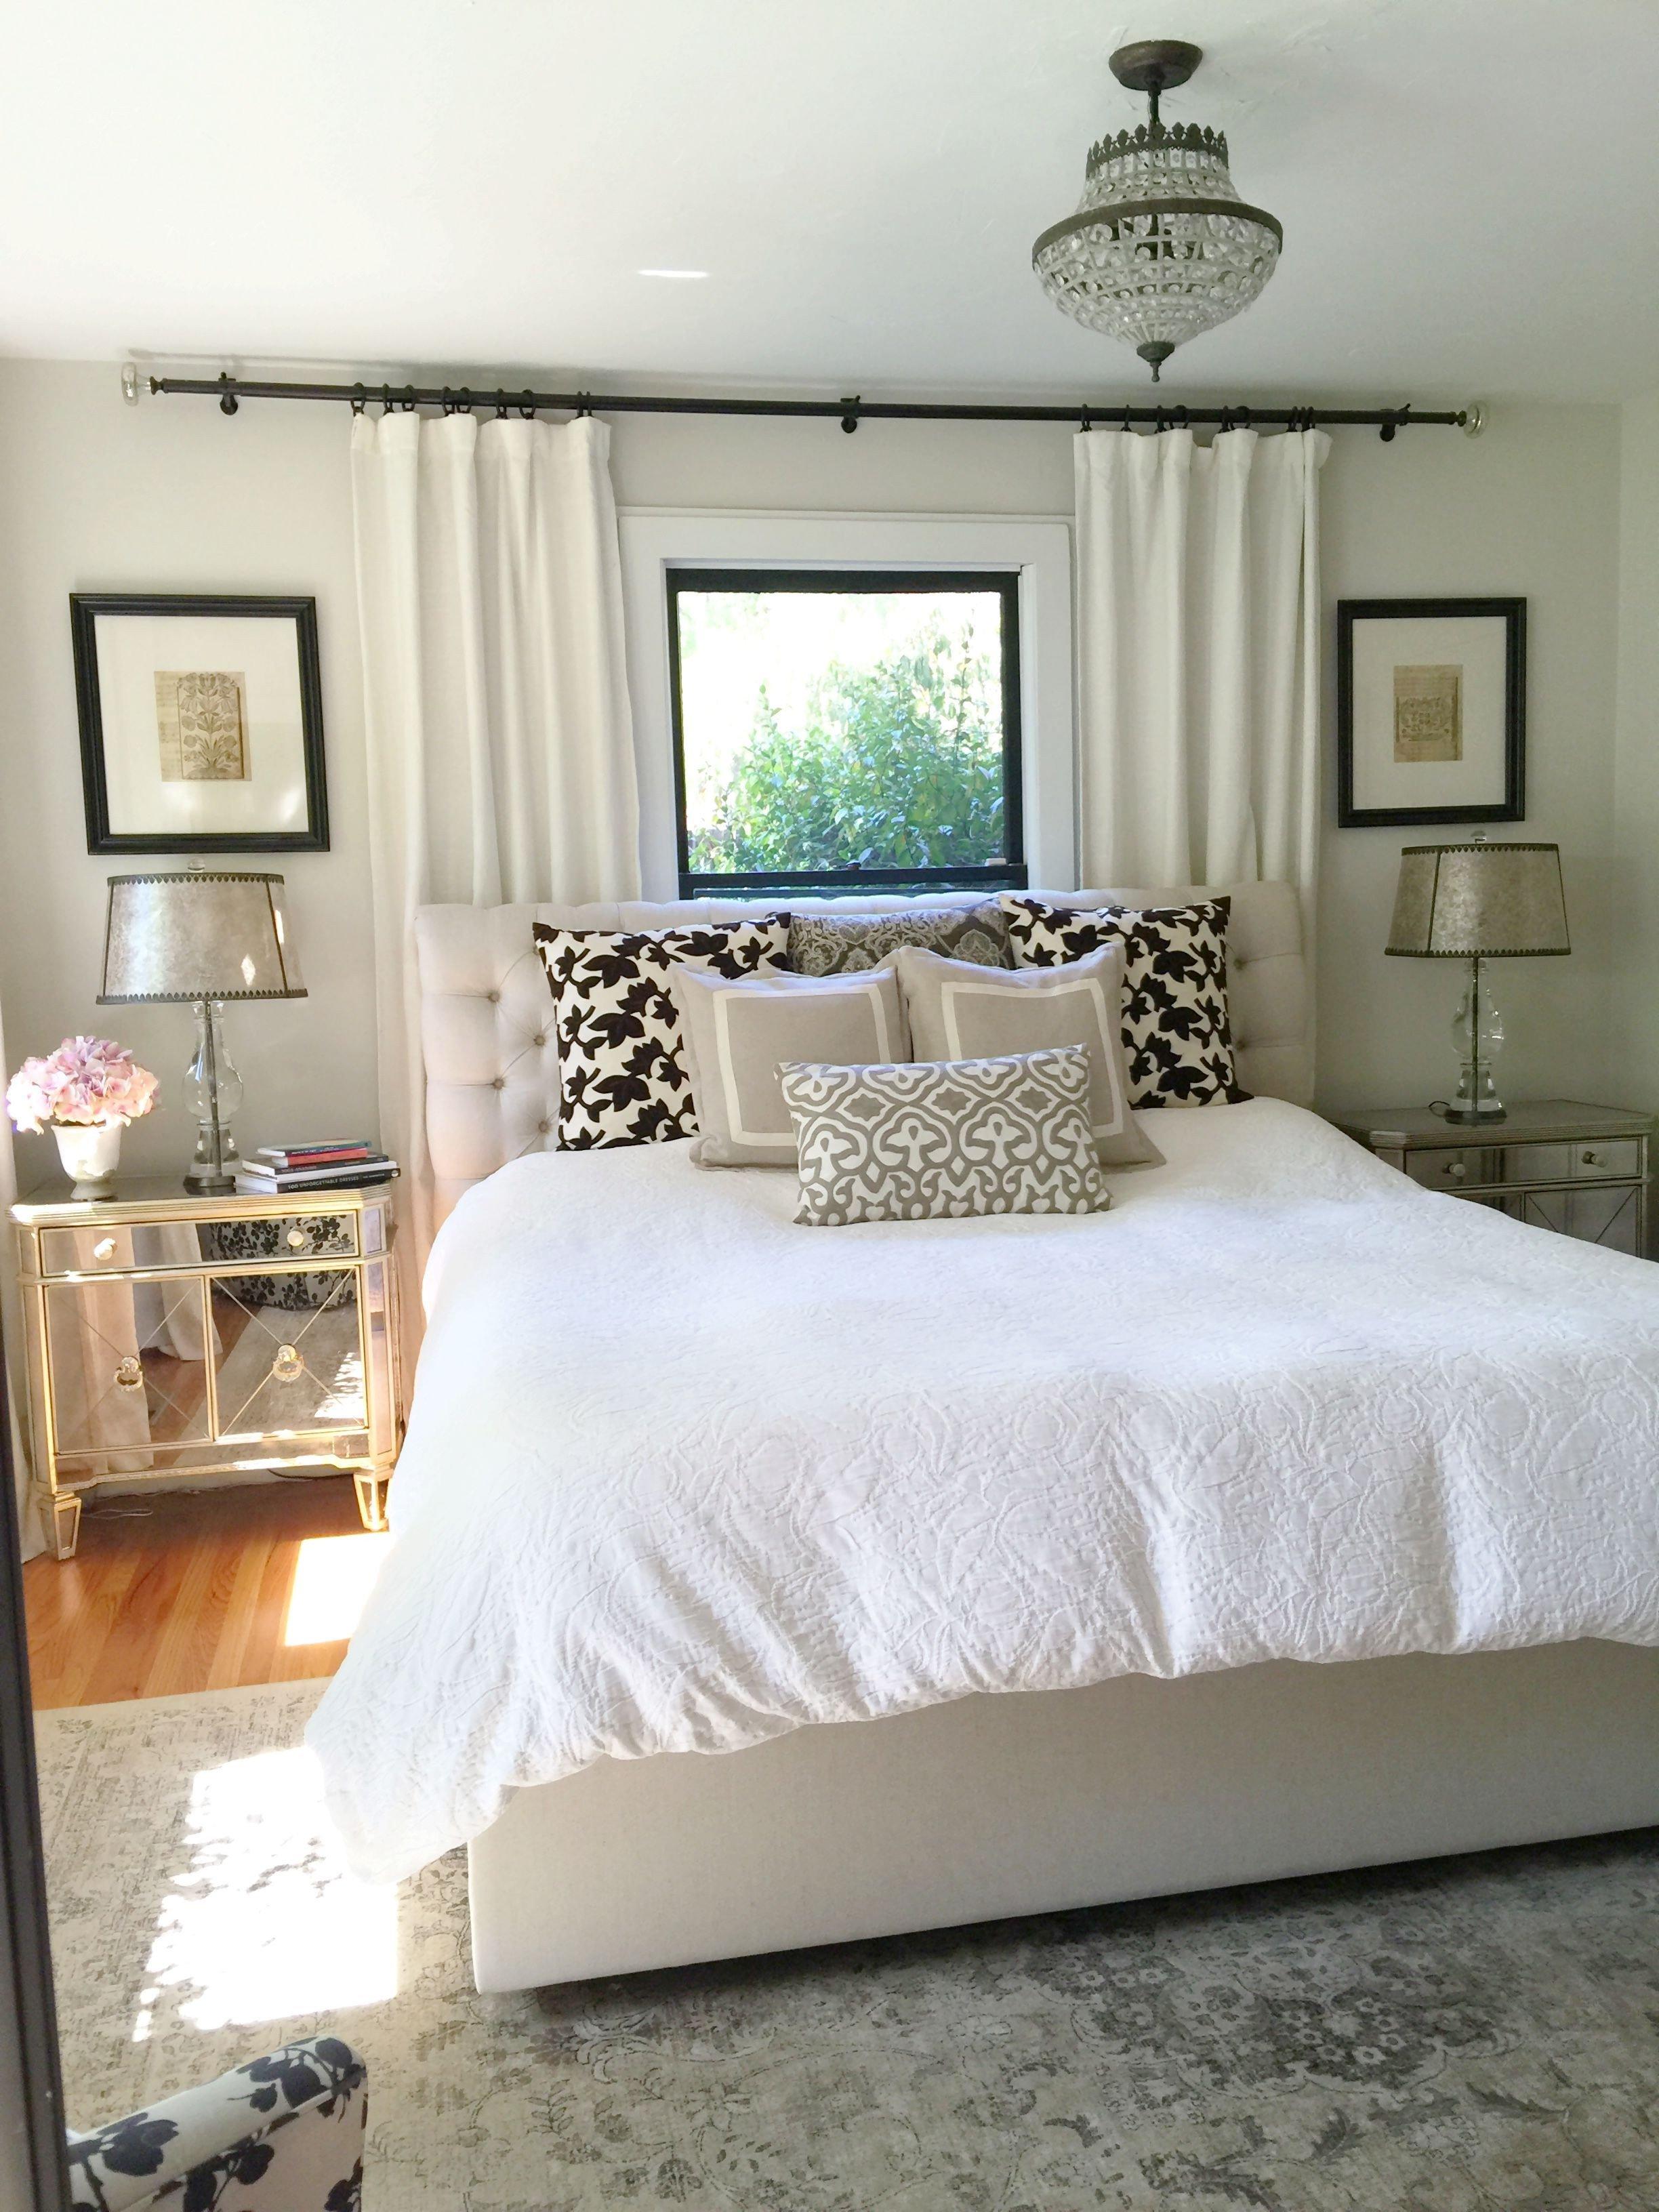 Small Master Bedroom Ideas Luxury Neutral Bedroom Window Behind Bed Bedroom Window